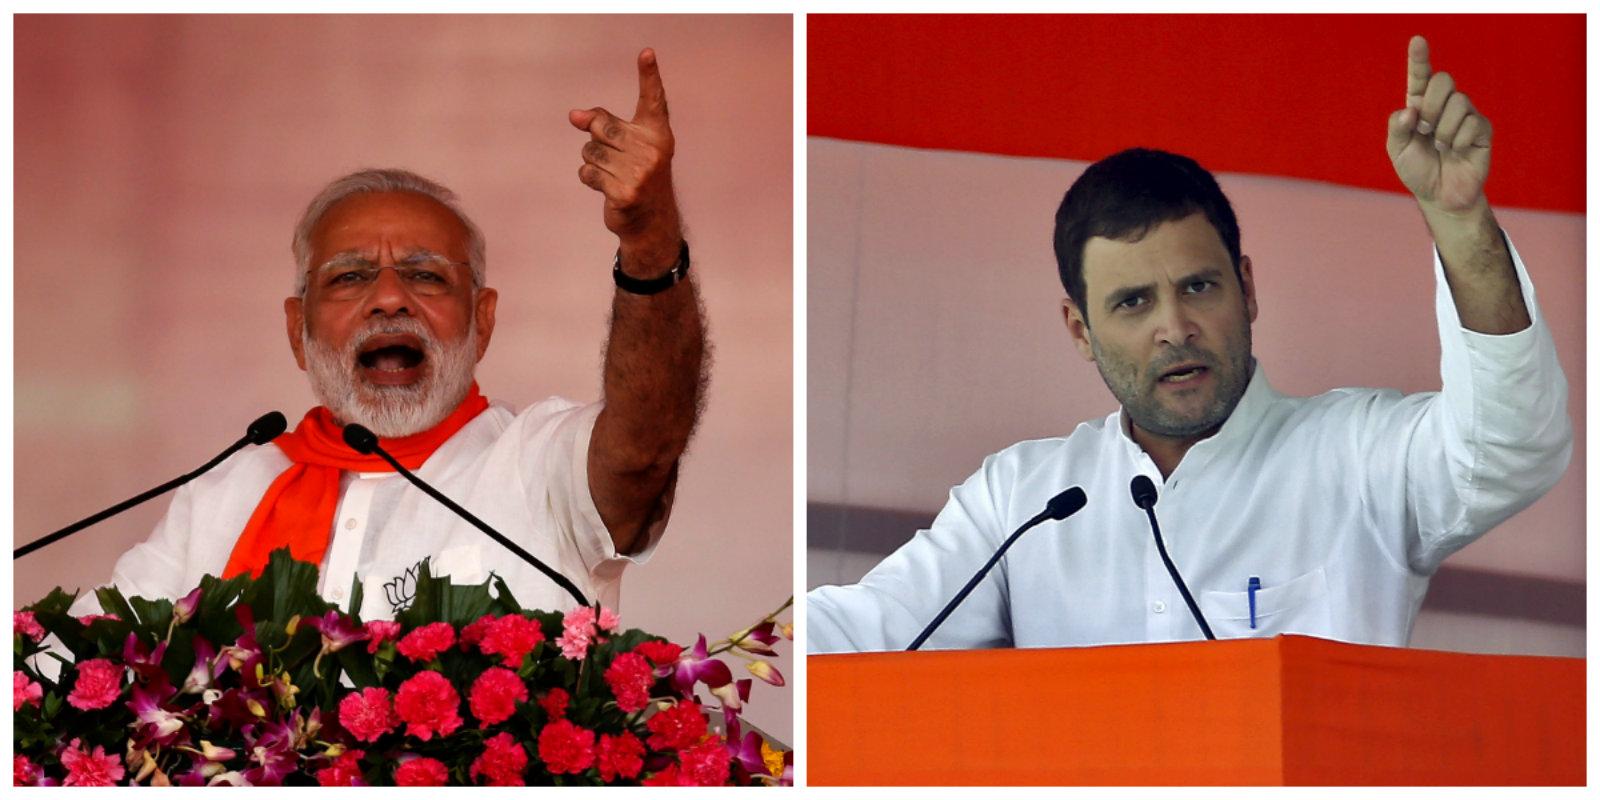 Narendra Modi addressing a rally near Ahmedabad. (R) Rahul Gandhi at another rally.